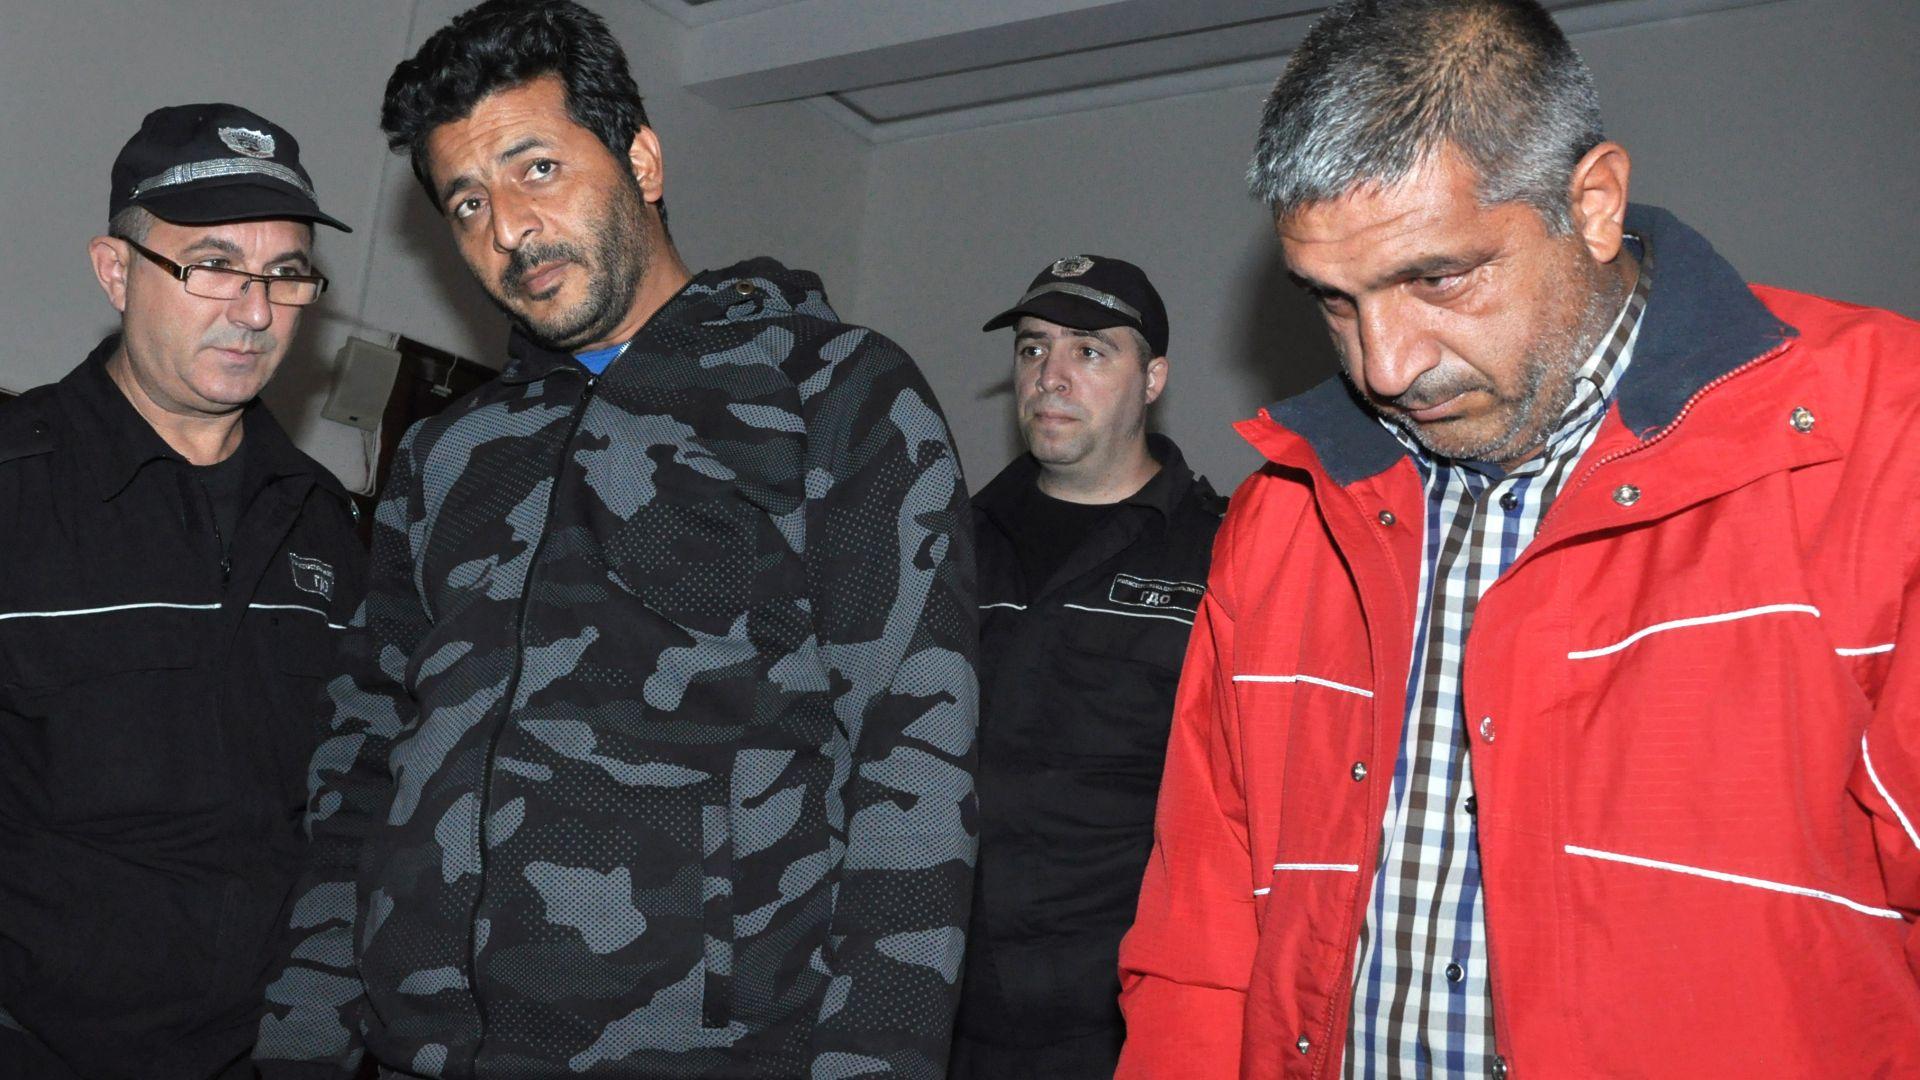 Двамата иранци, хванати с над 700 кг хероин: Не знаехме какво возим